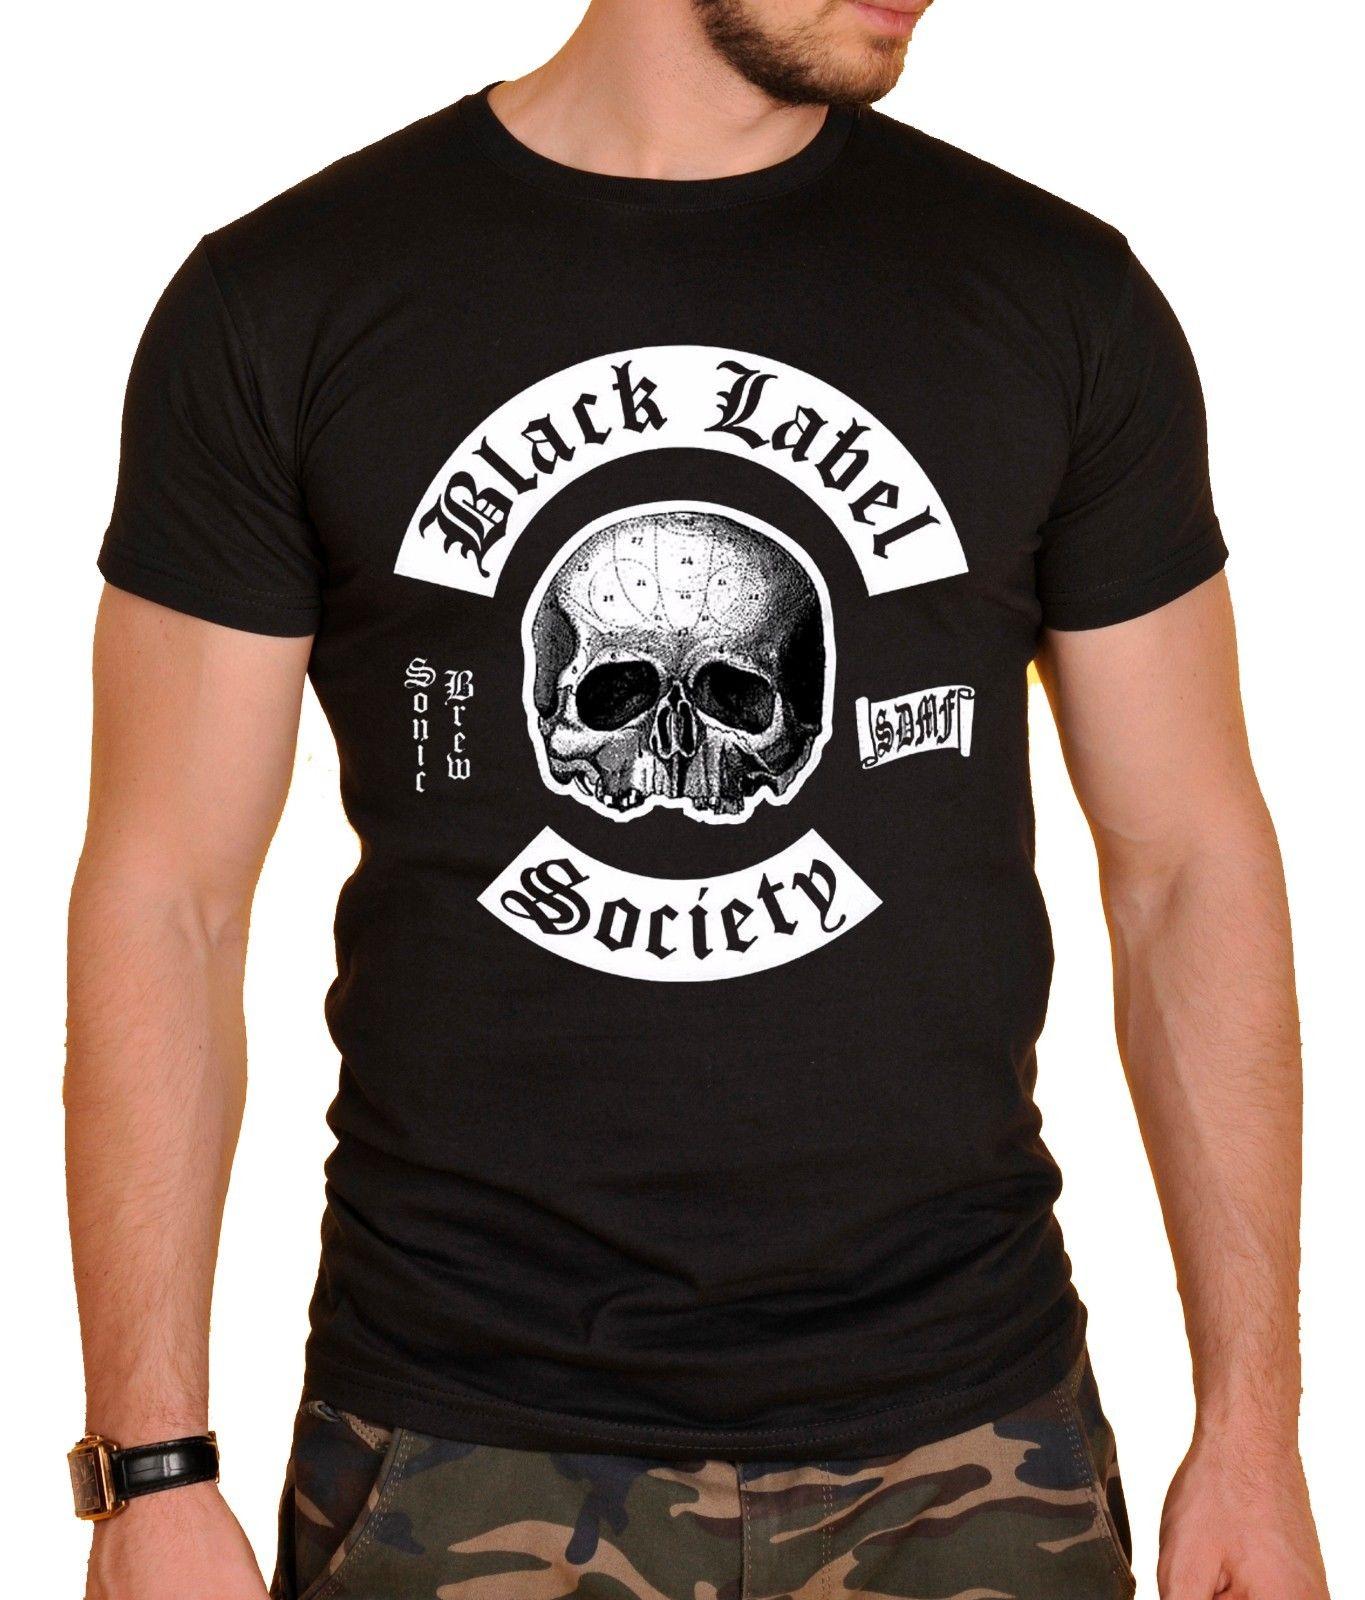 Black Label Society BLS Metal Rock Band Skull Men S Black T Shirt Size S To